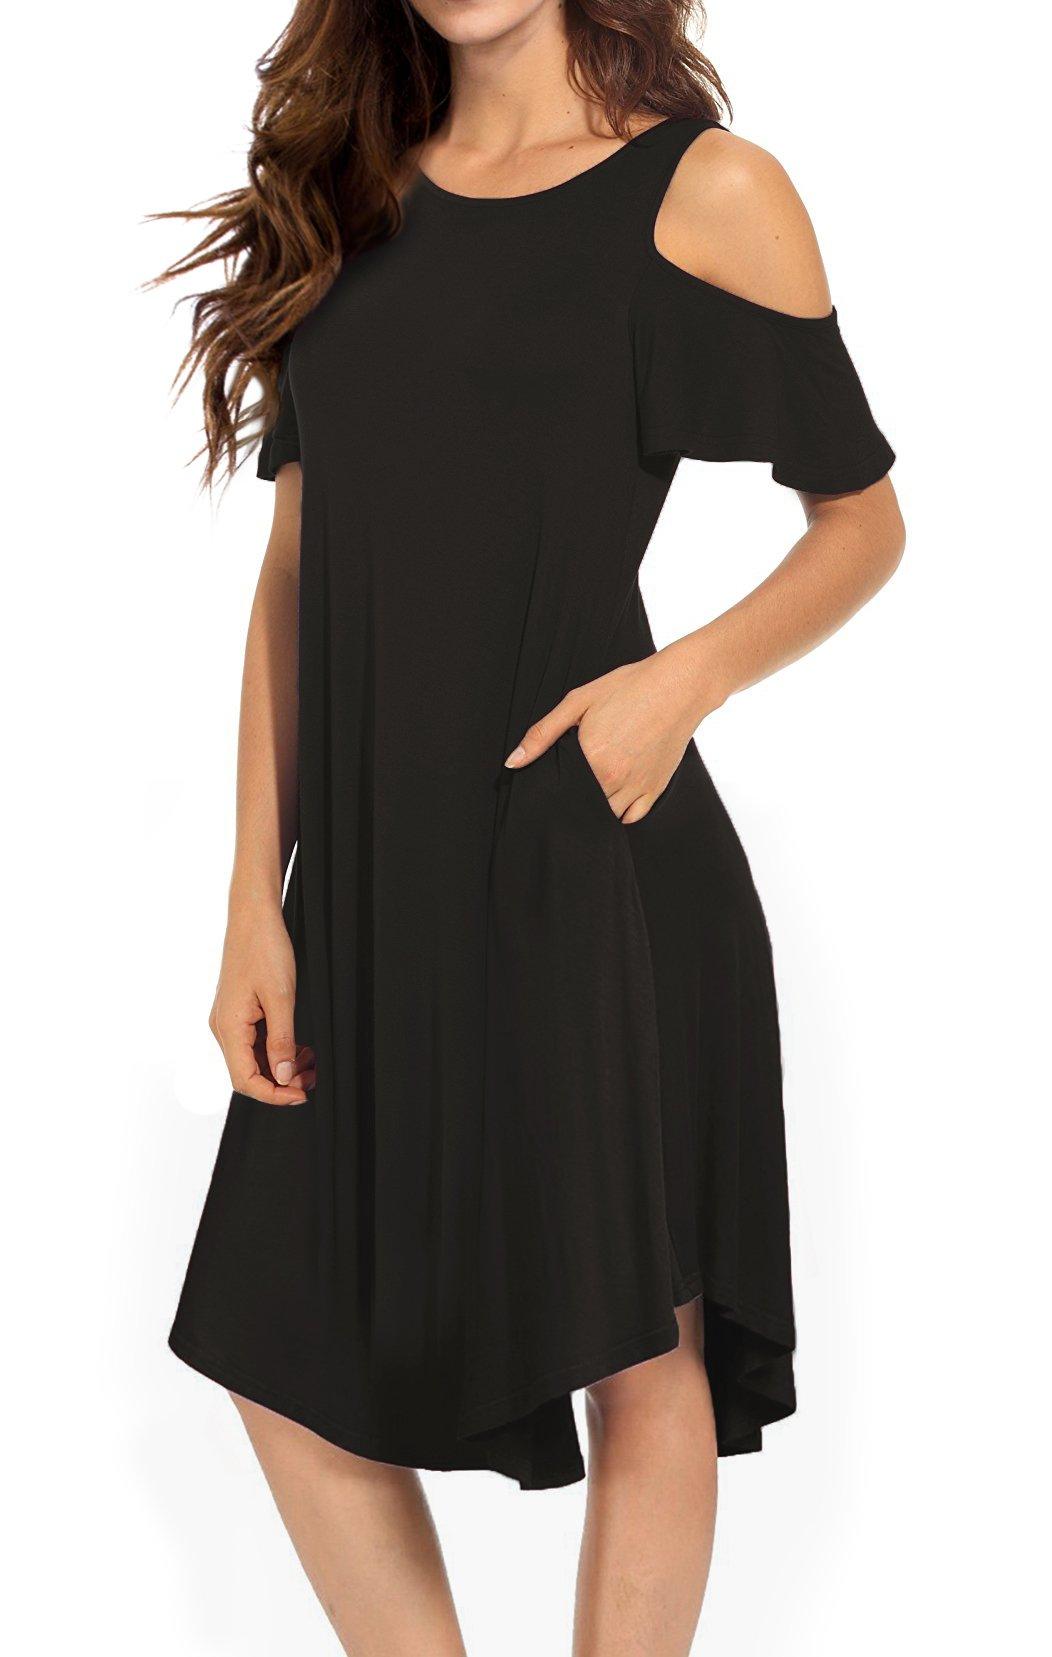 VERABENDI Women's Casual Cold Shoulder Midi Dress Short Sleeve Swing Dress with Pockets Coffee XL